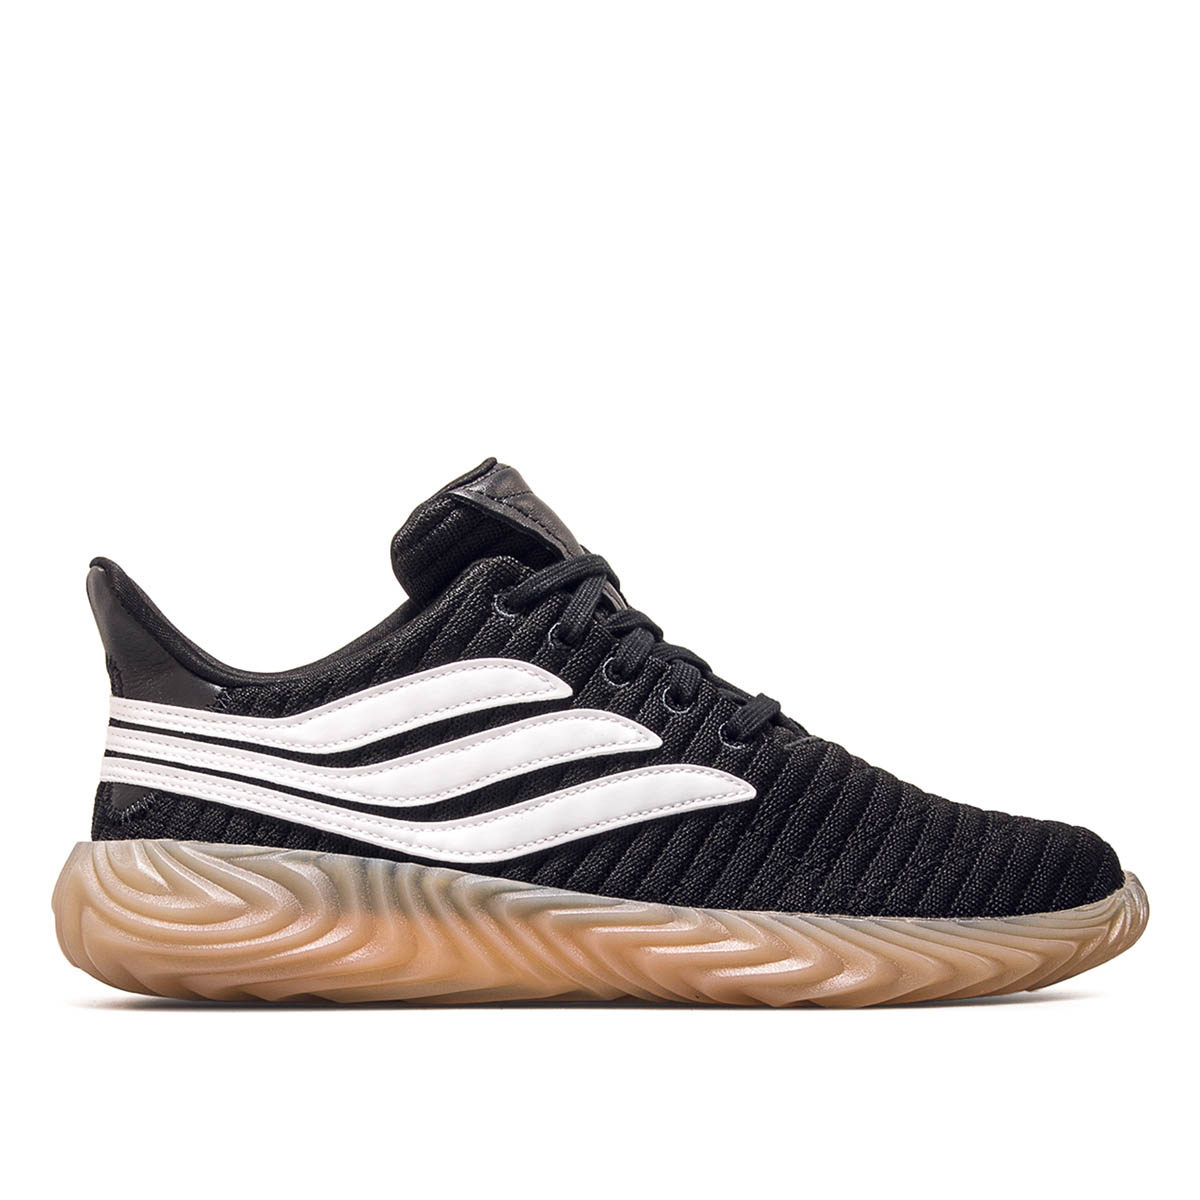 promo code 2ffad a6bb1 schwarzen Unisex Sneaker von Adidas online kaufen   CRISP BLNDamen    Sneaker   Sale   CRISP BLN